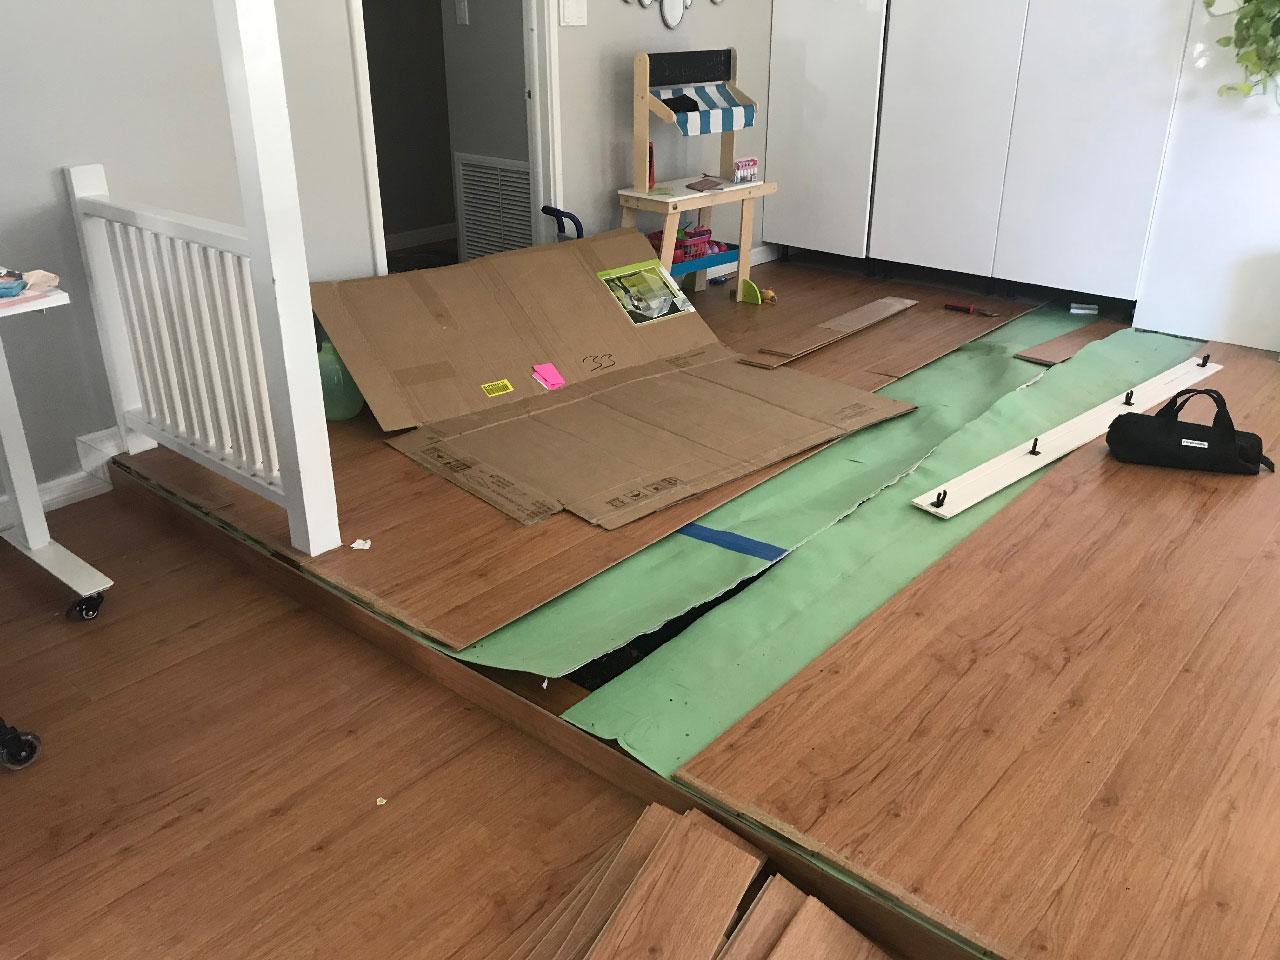 Assessing the living room floor damage